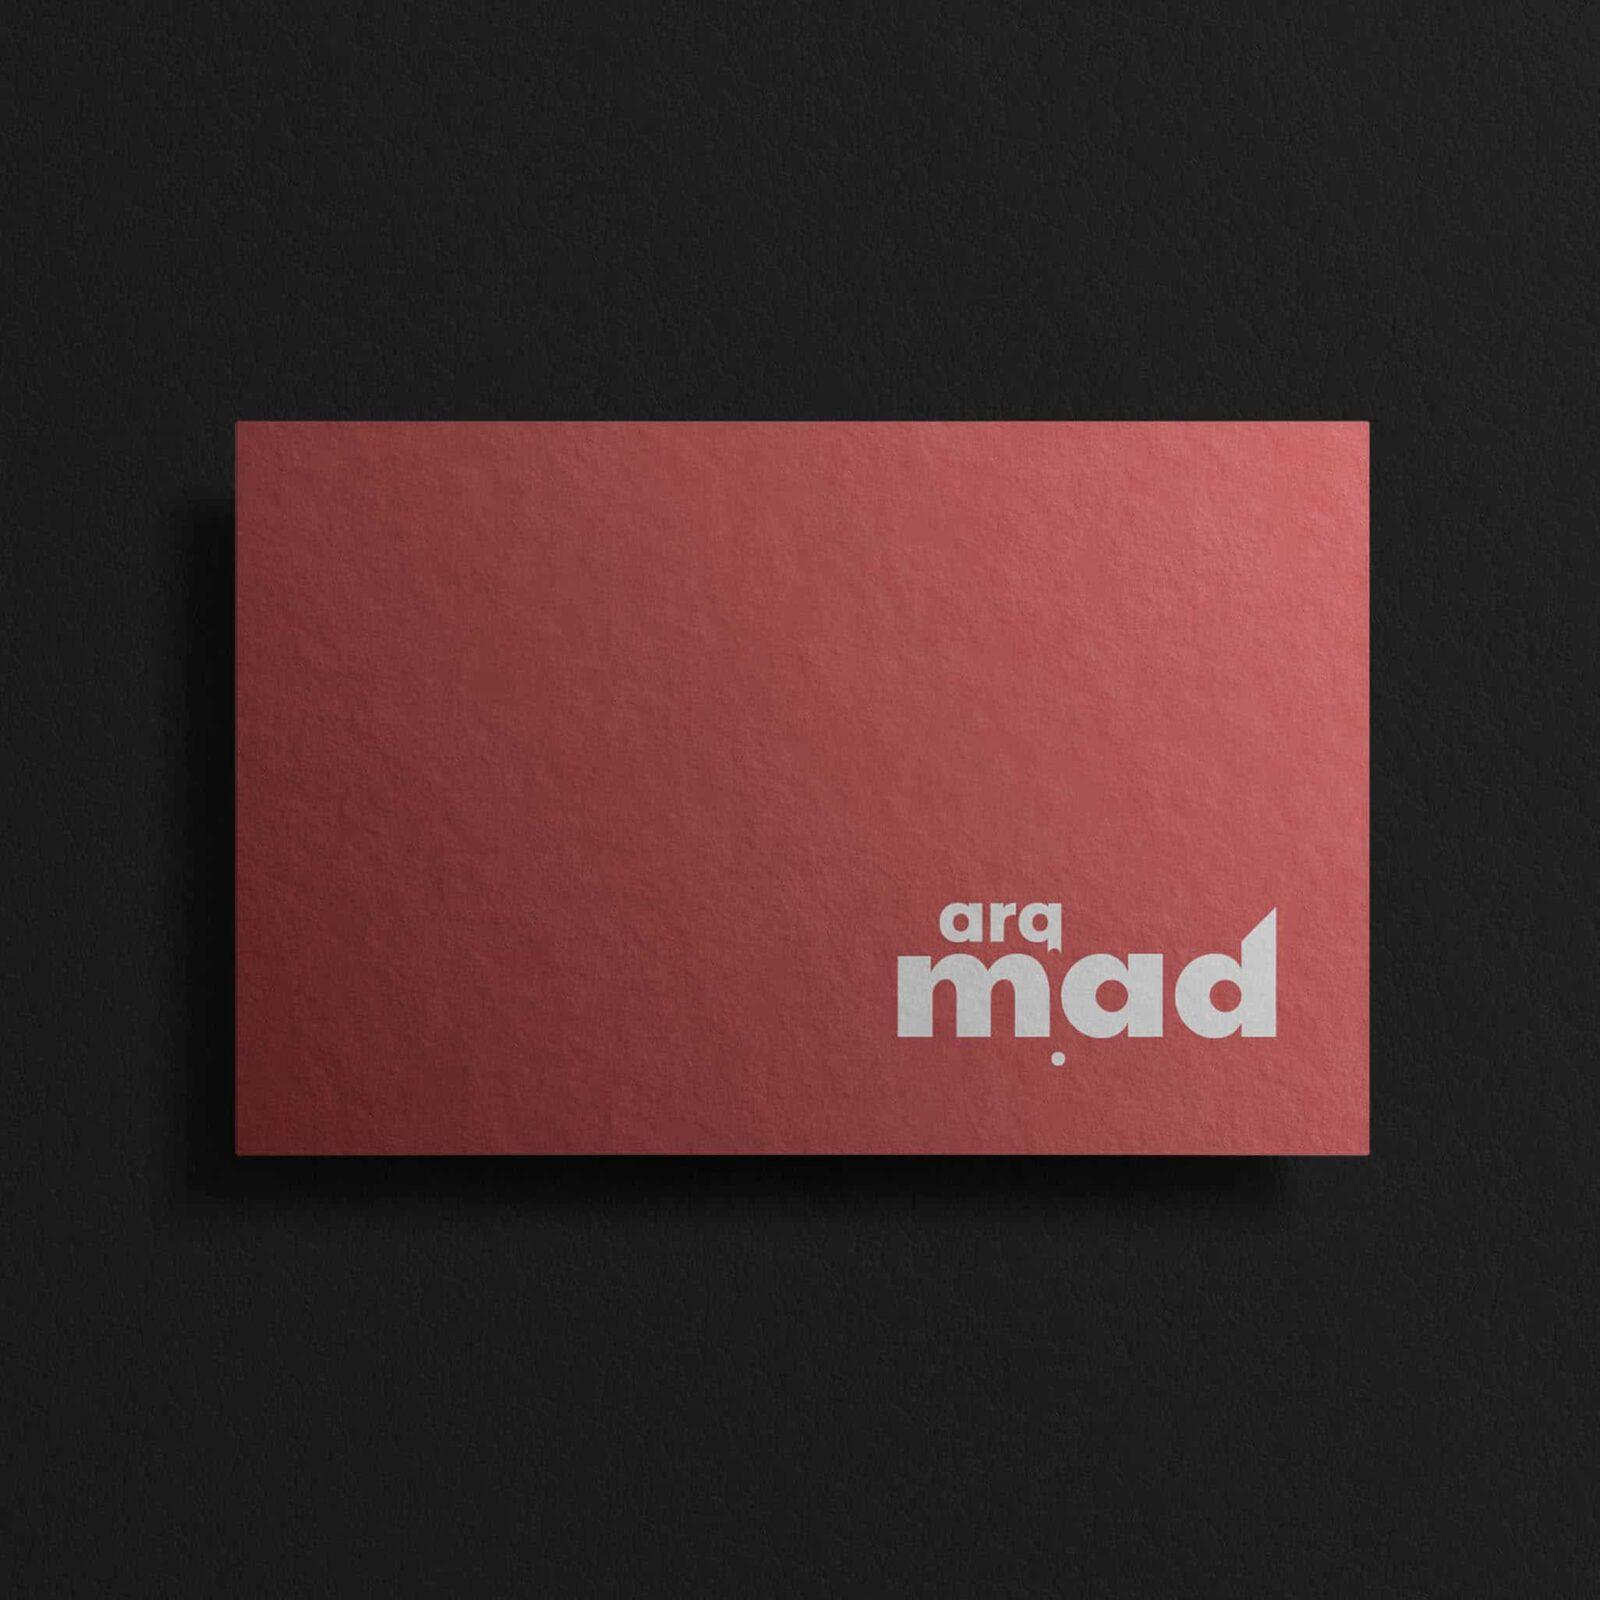 diseño grafico ourense diseño tarjeta corporativa arqmad